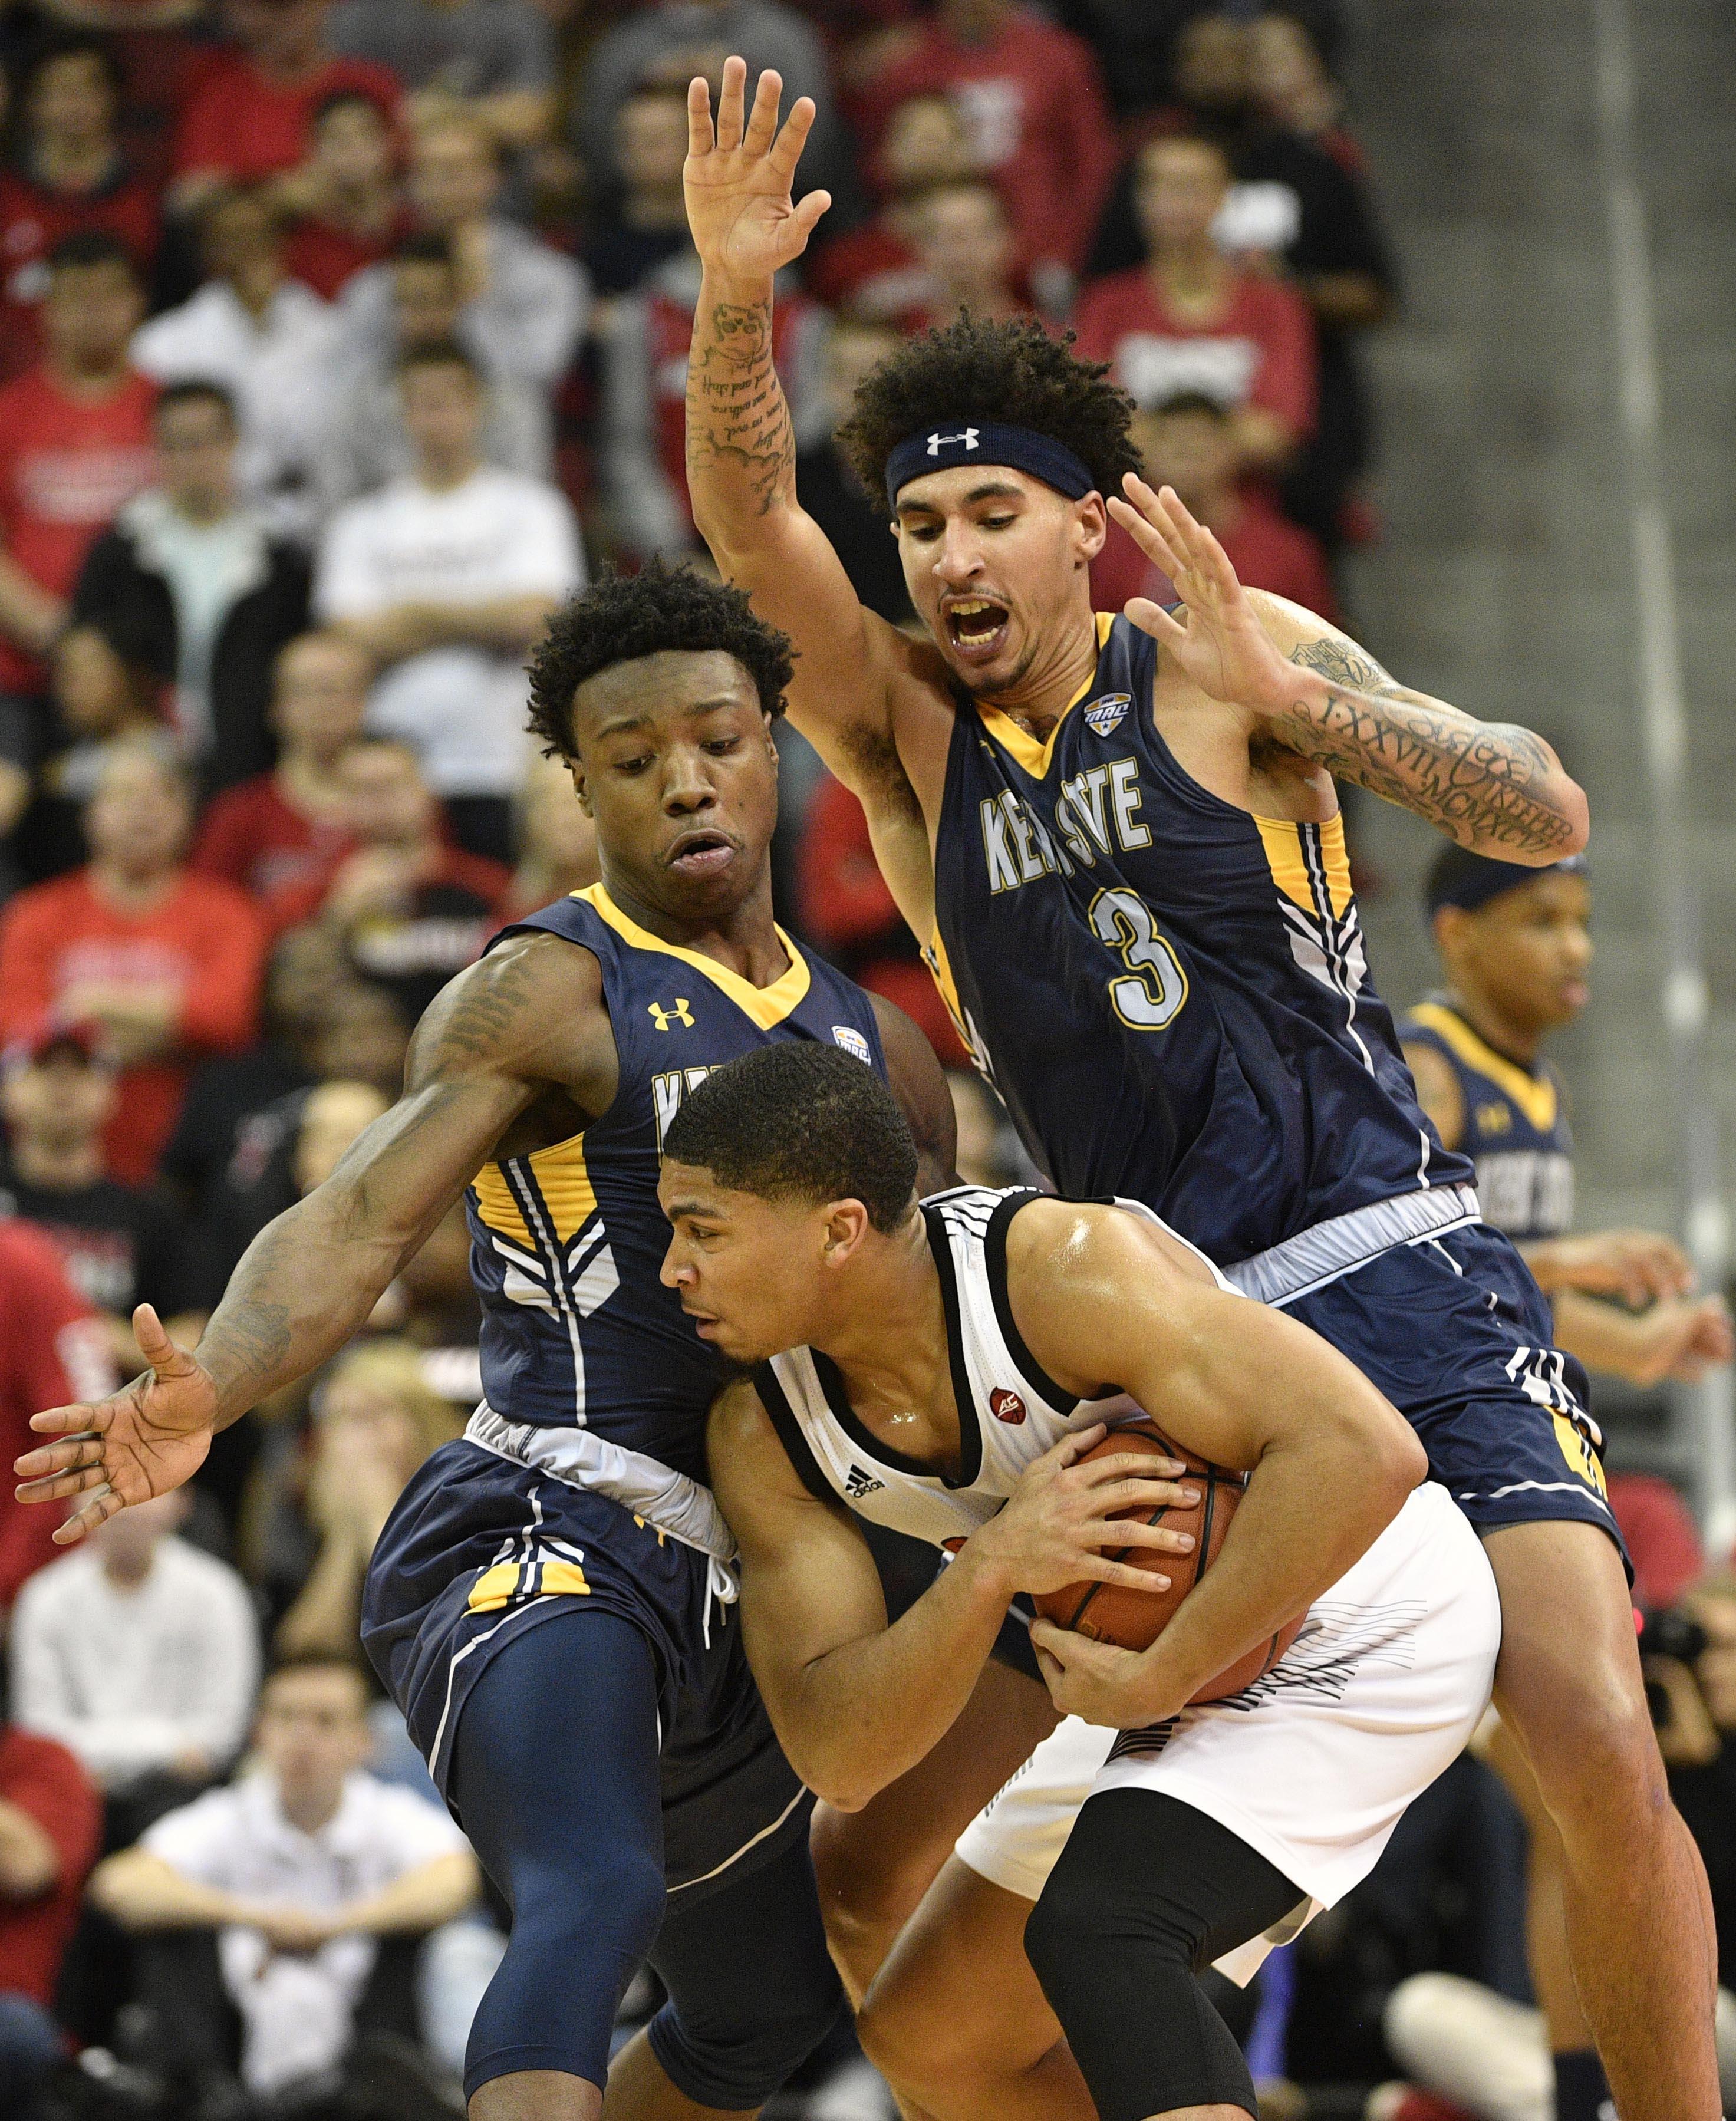 NCAA篮球:路易斯维尔的肯特州立大学